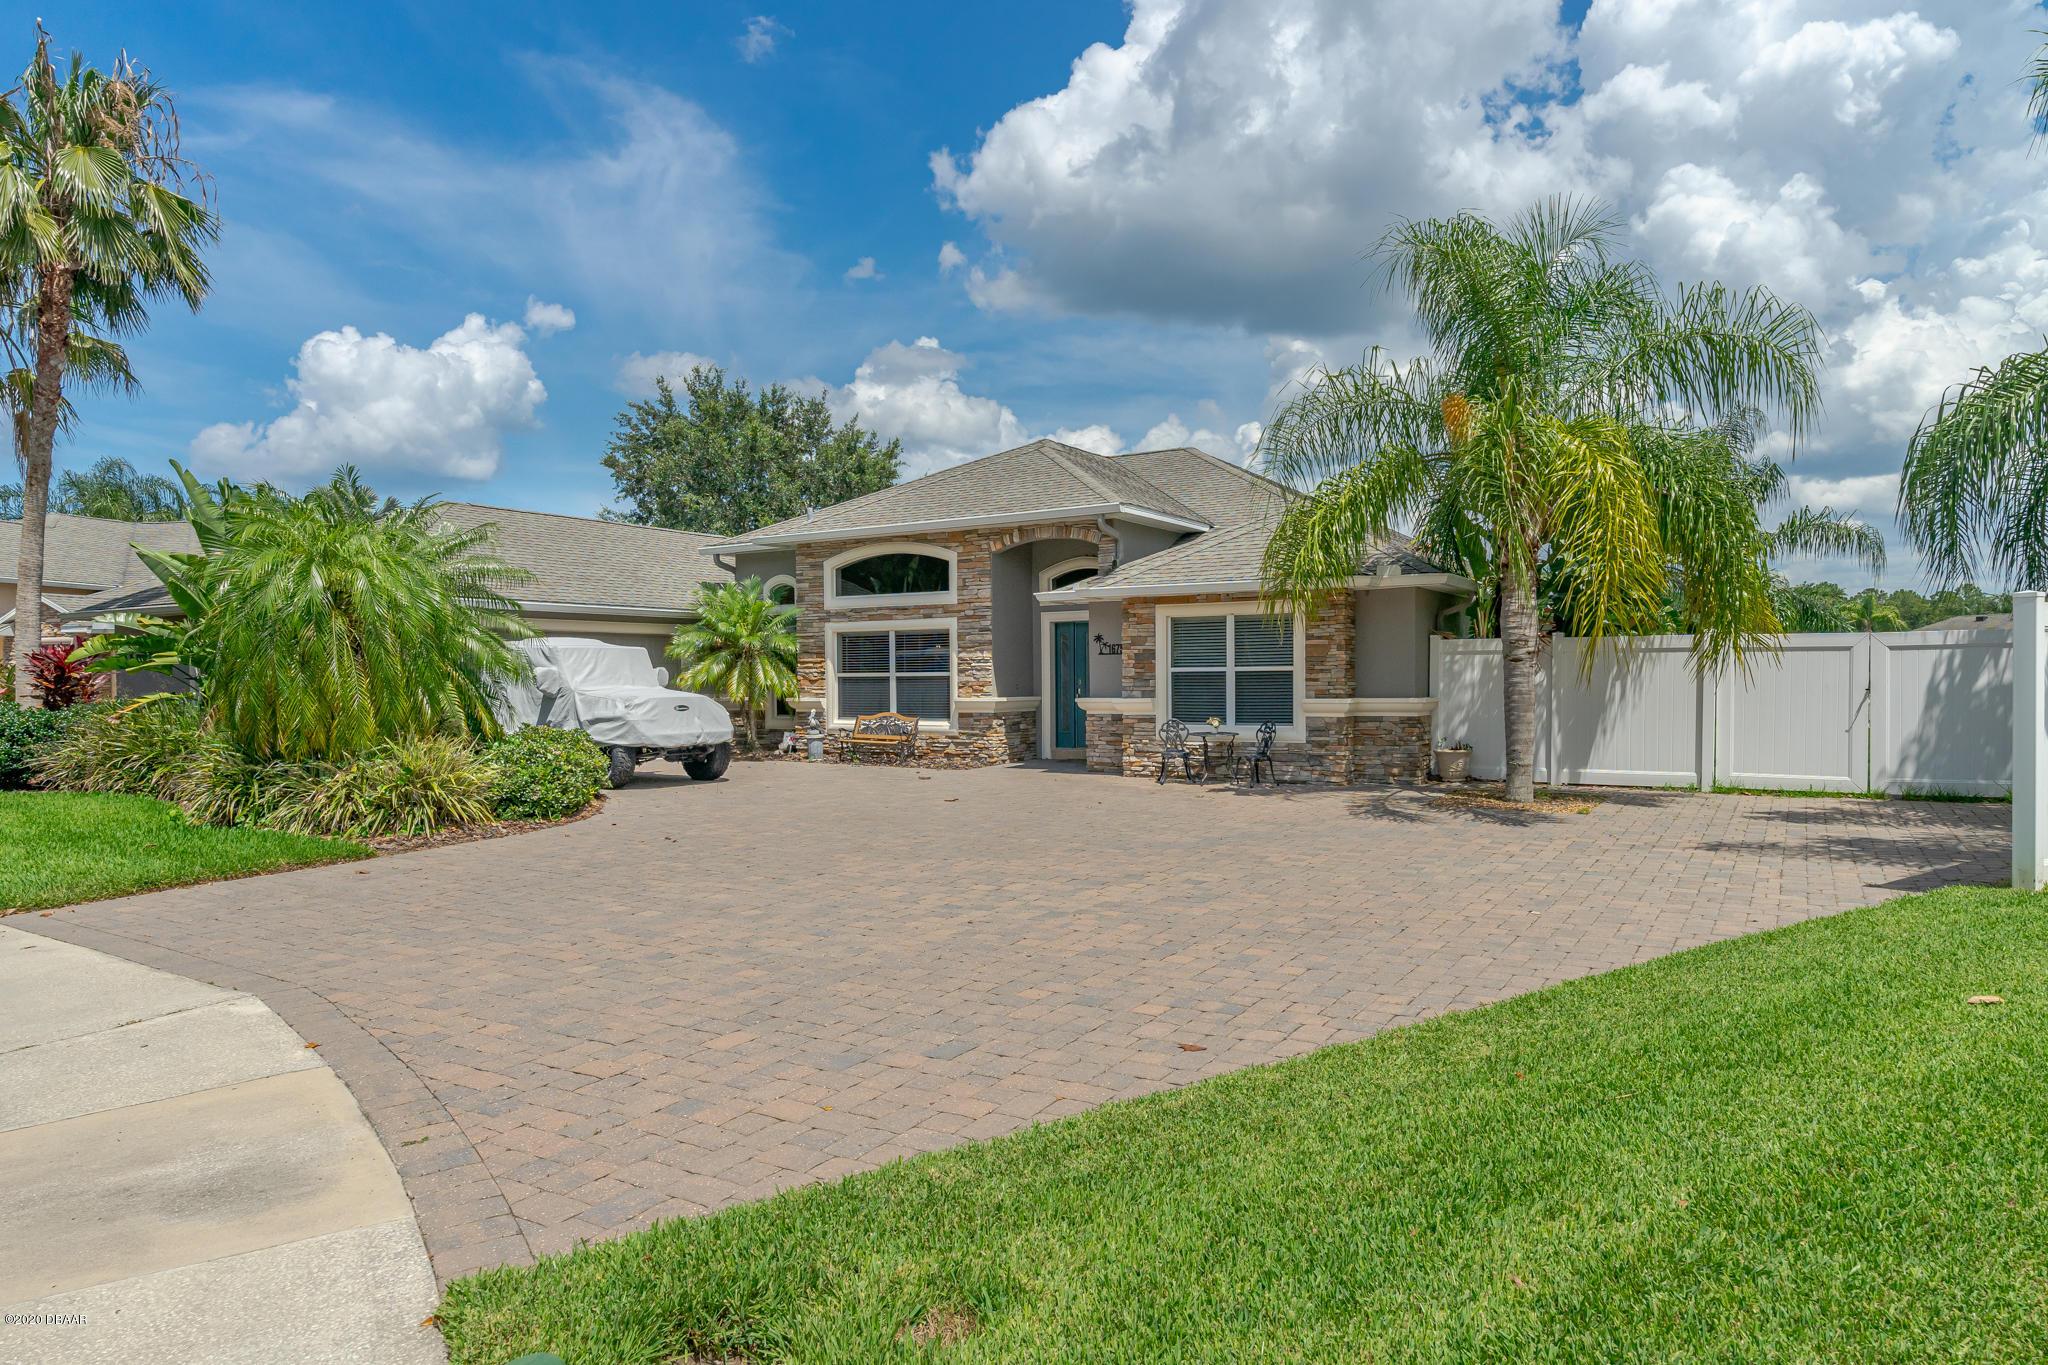 Photo of 1675 New Town Terrace, Port Orange, FL 32129